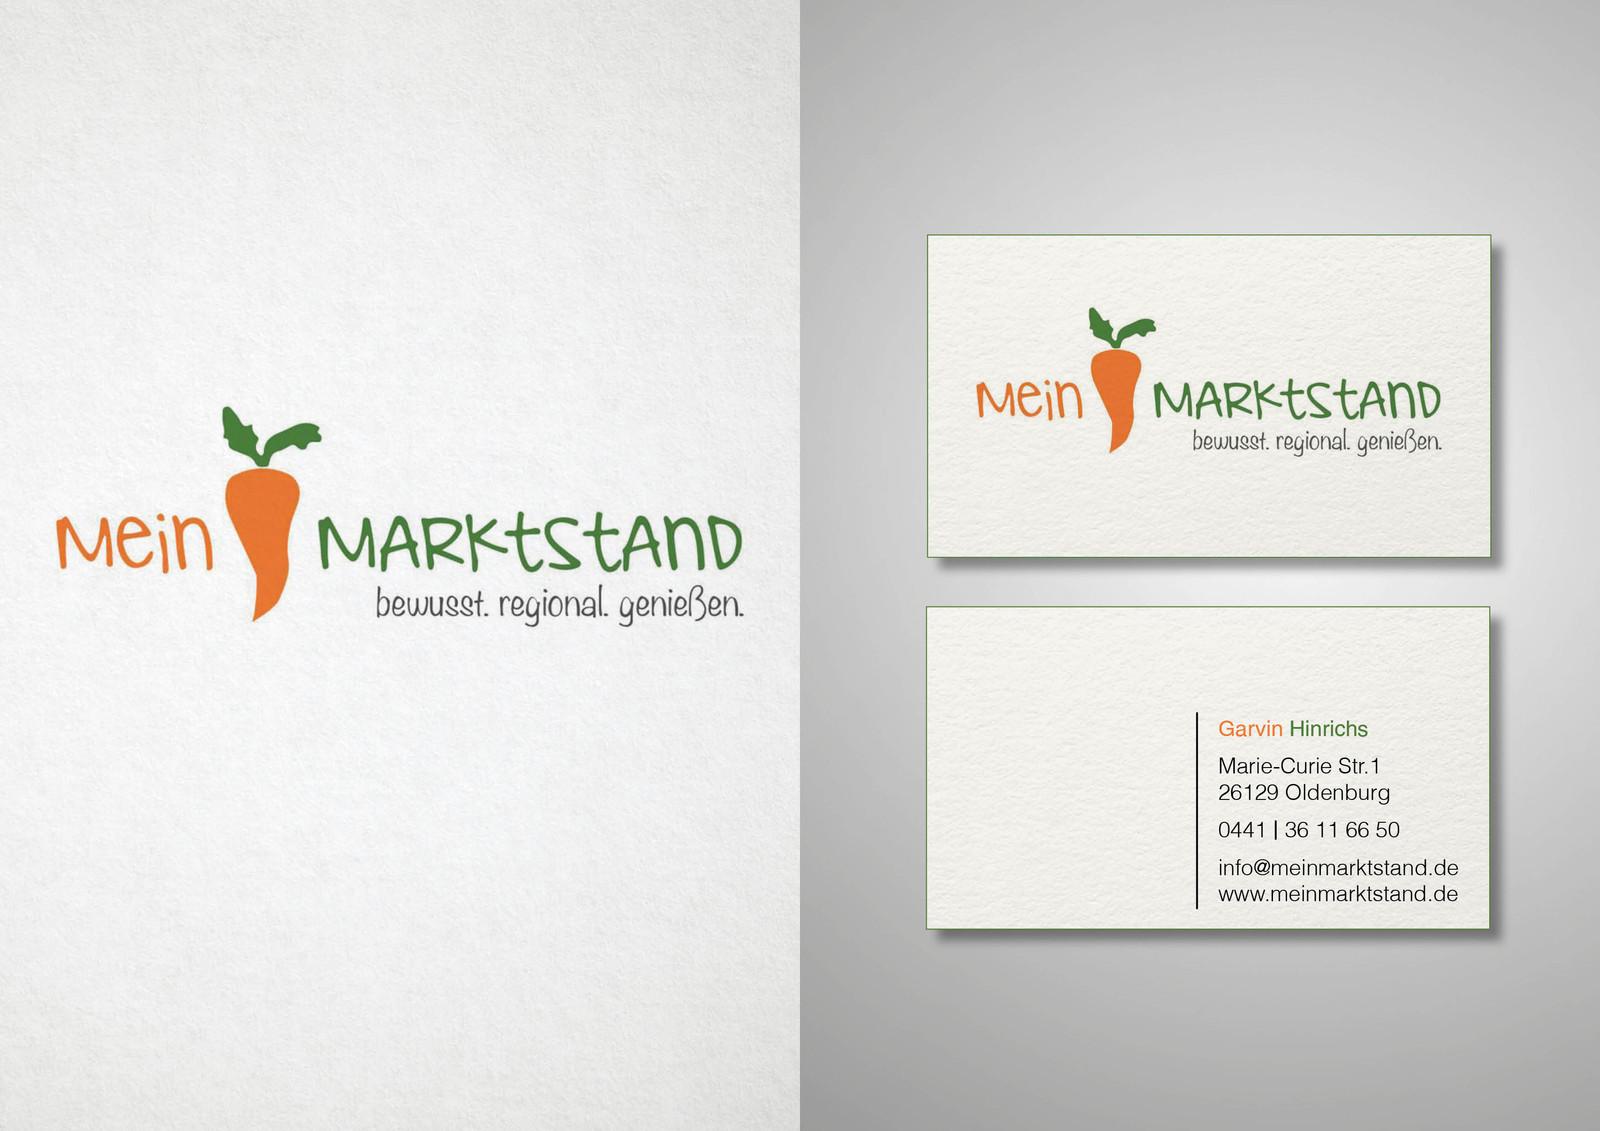 Corporate Design Beratung Logo Und Visitenkarten Gestaltung